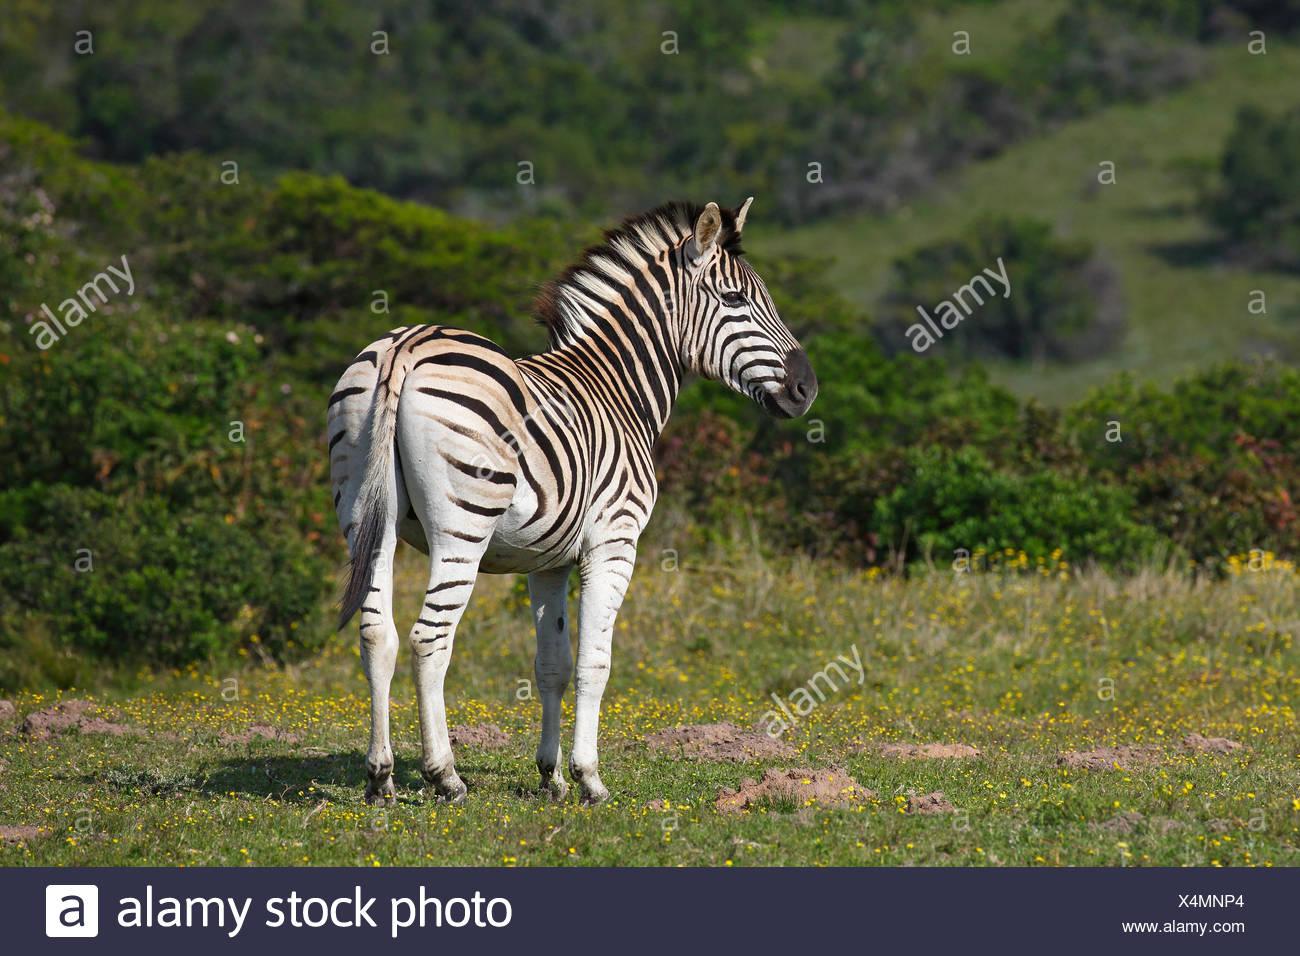 Zebra (Equus quagga burchelli) Burchell's Zebra, Addo Elephant National Park, South Africa - Stock Image